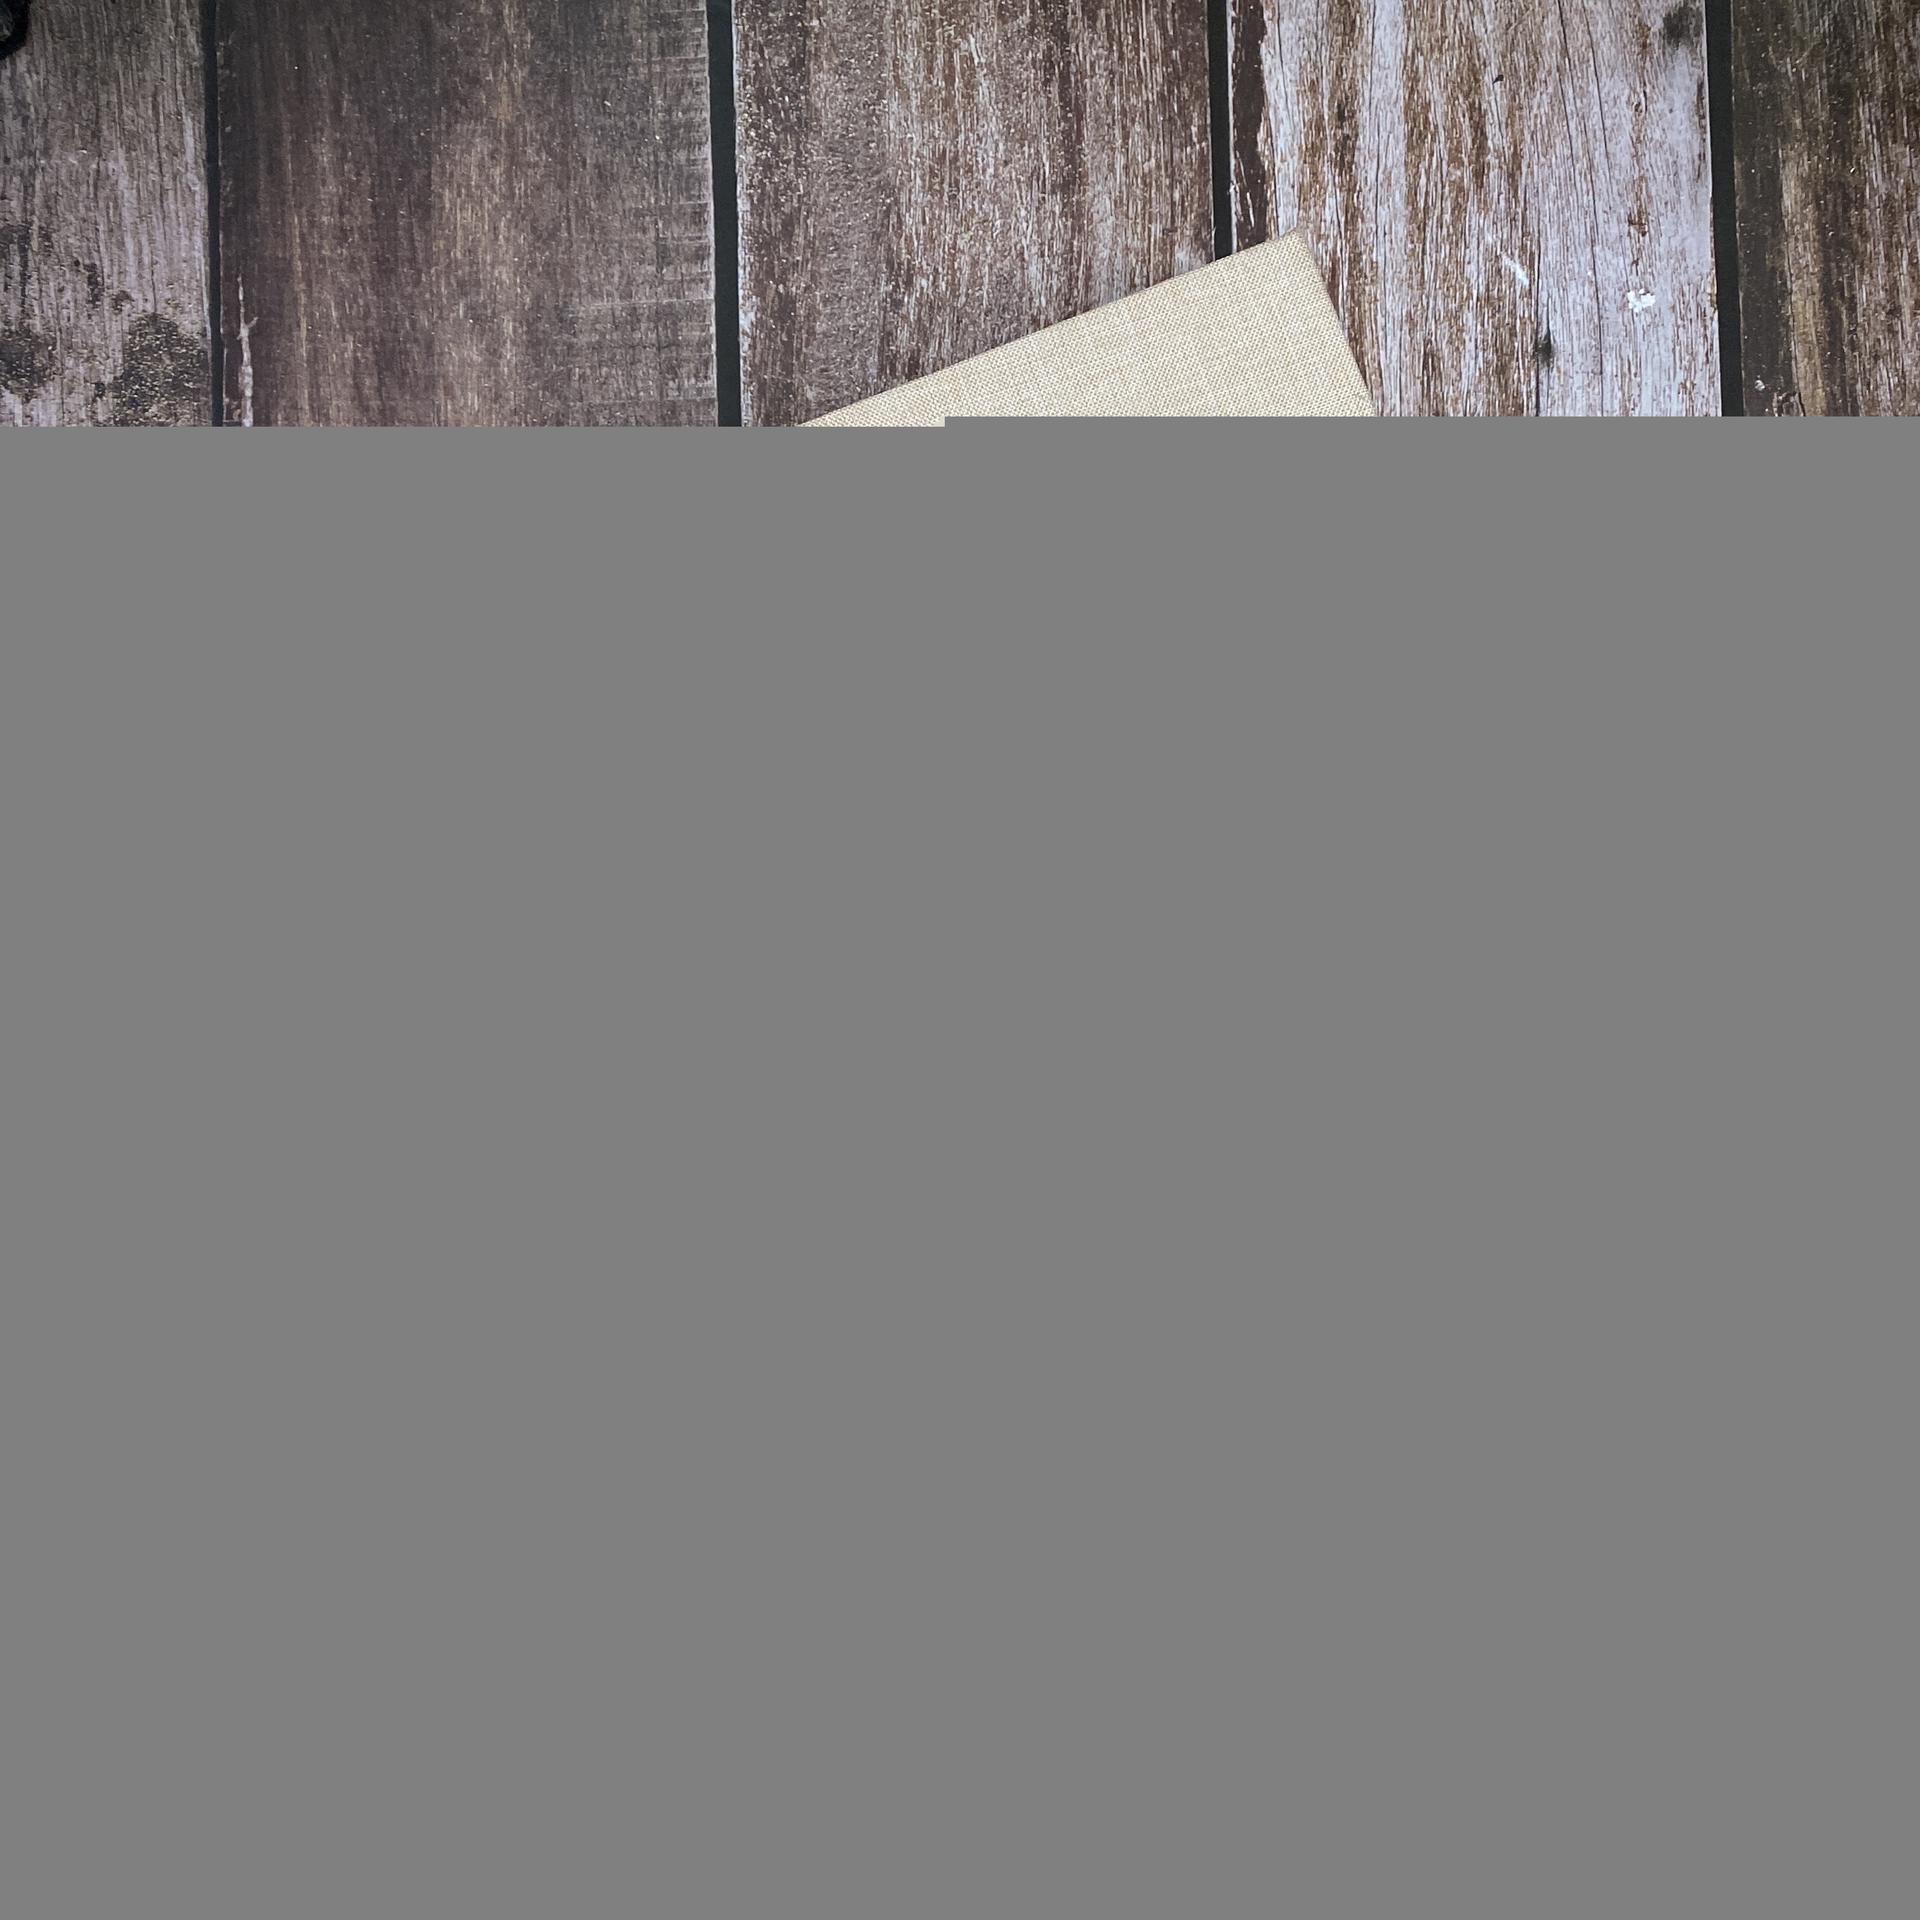 product-Dezheng-Photo Album Fabric Cover Linen DIY Photo Album Self Adhesive Cotton Photo Album-img-1